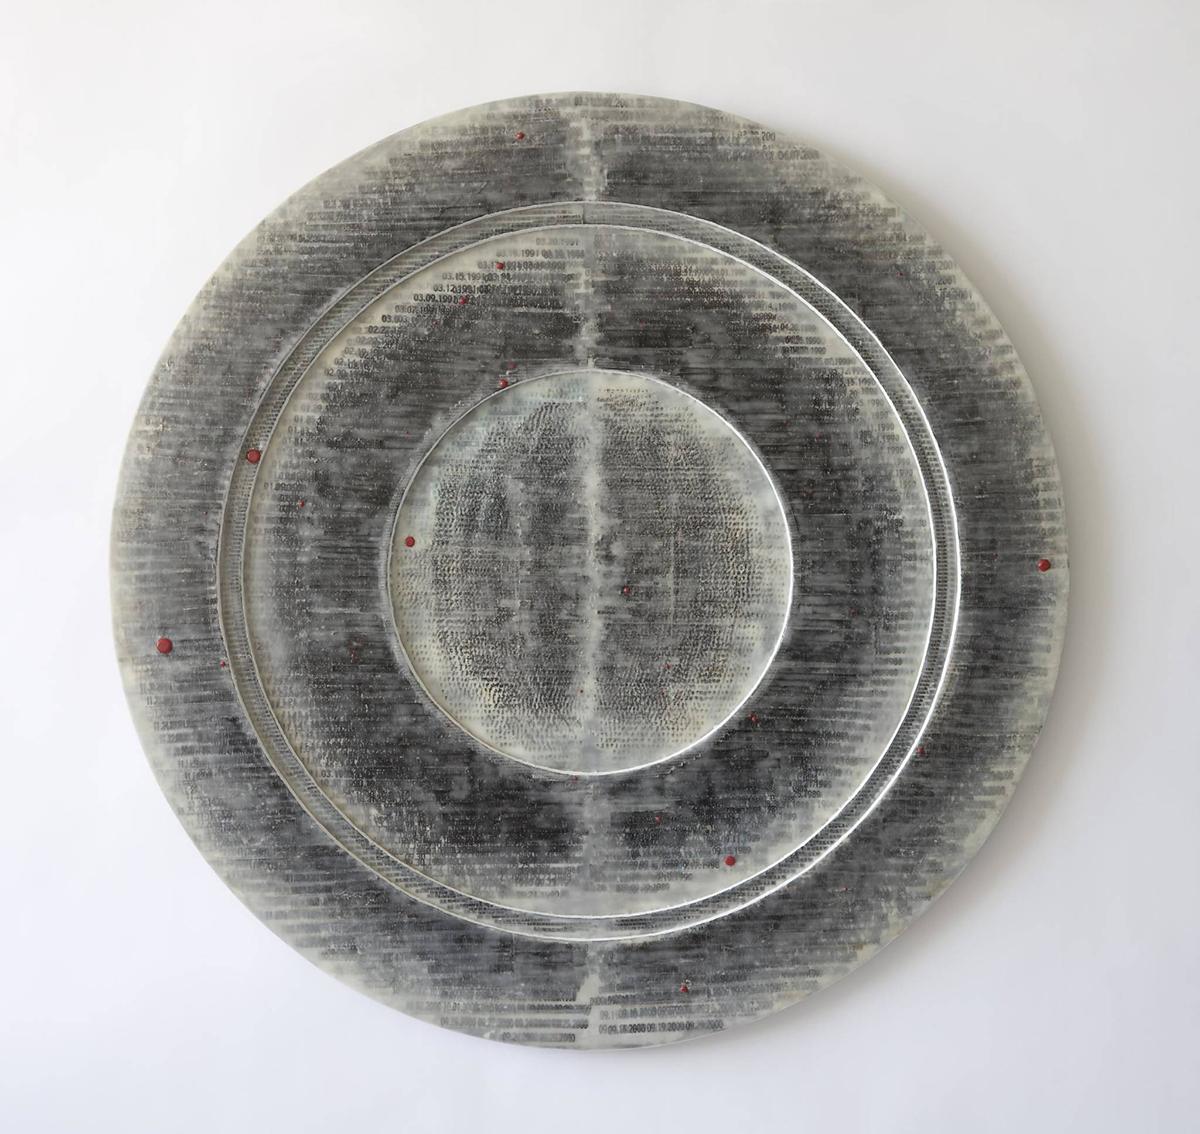 Taraneh Hemami, 'Recounting,' 2011.